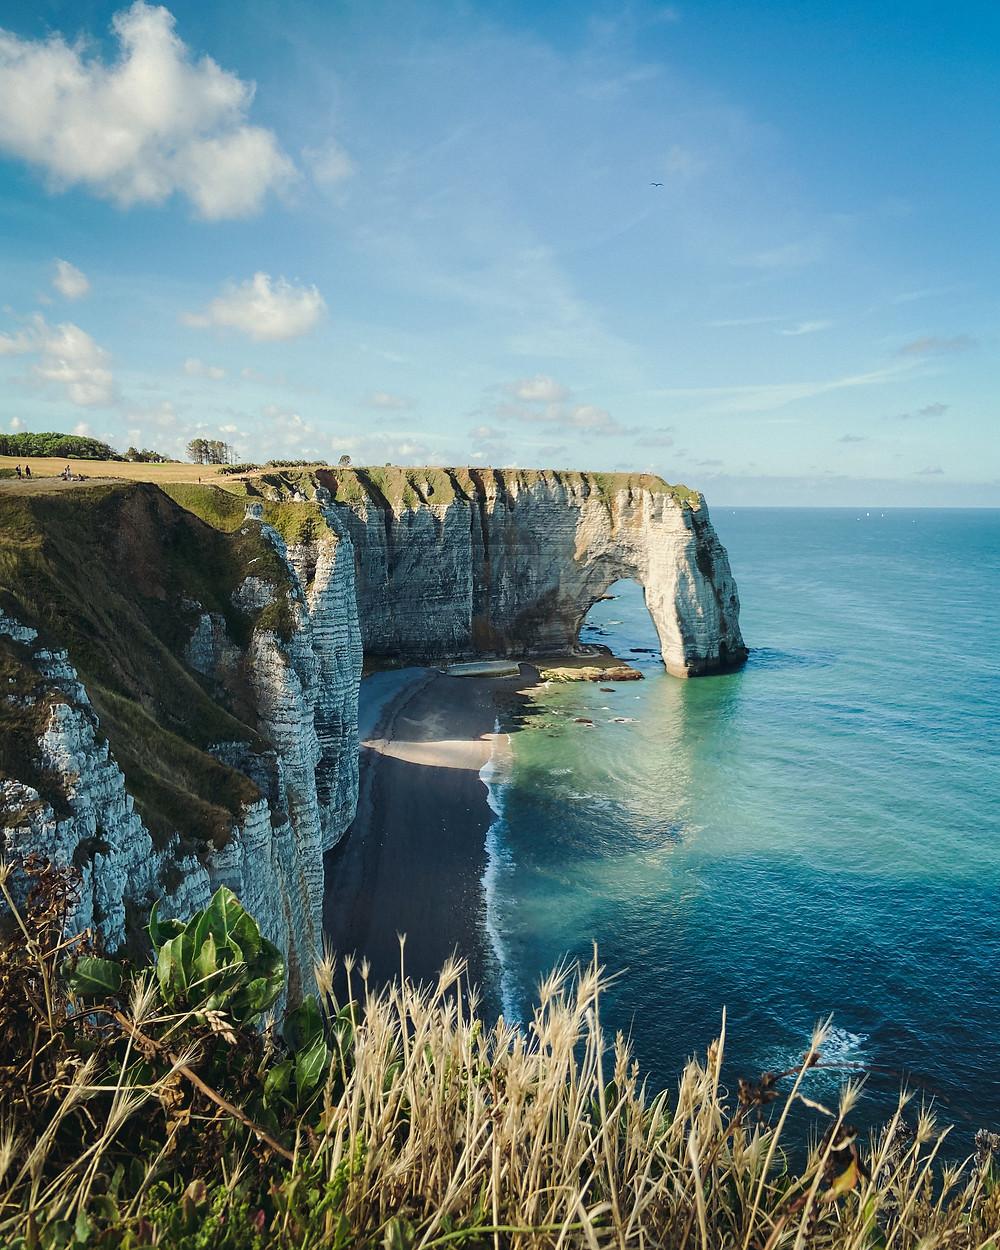 cliffs of Etretat in Normandy